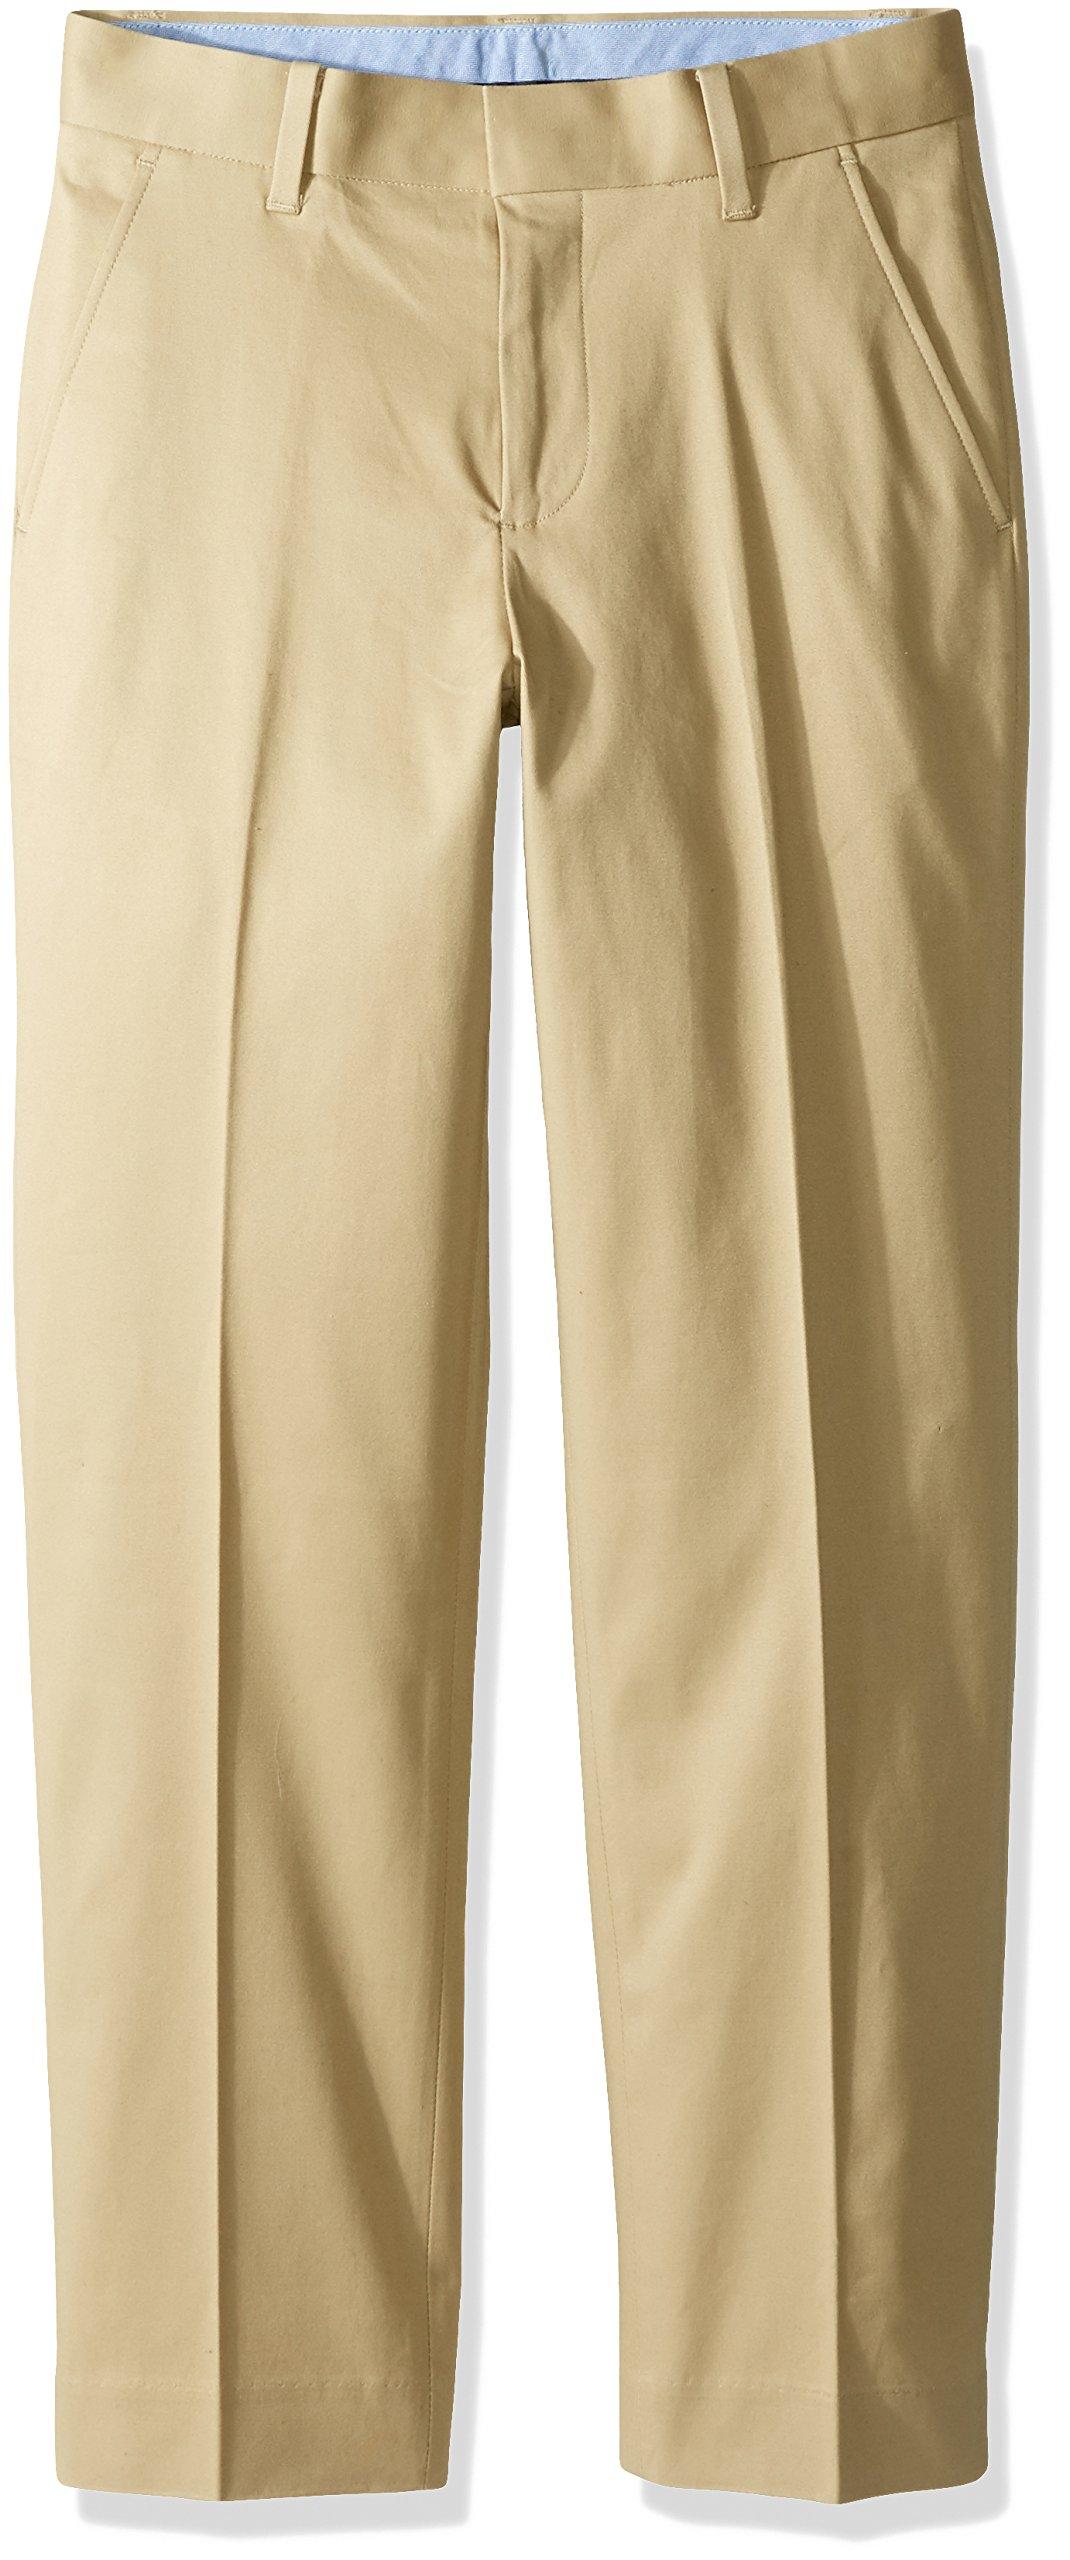 Tommy Hilfiger Big Boys' Fine Twill Pant, Medium Khaki, 12